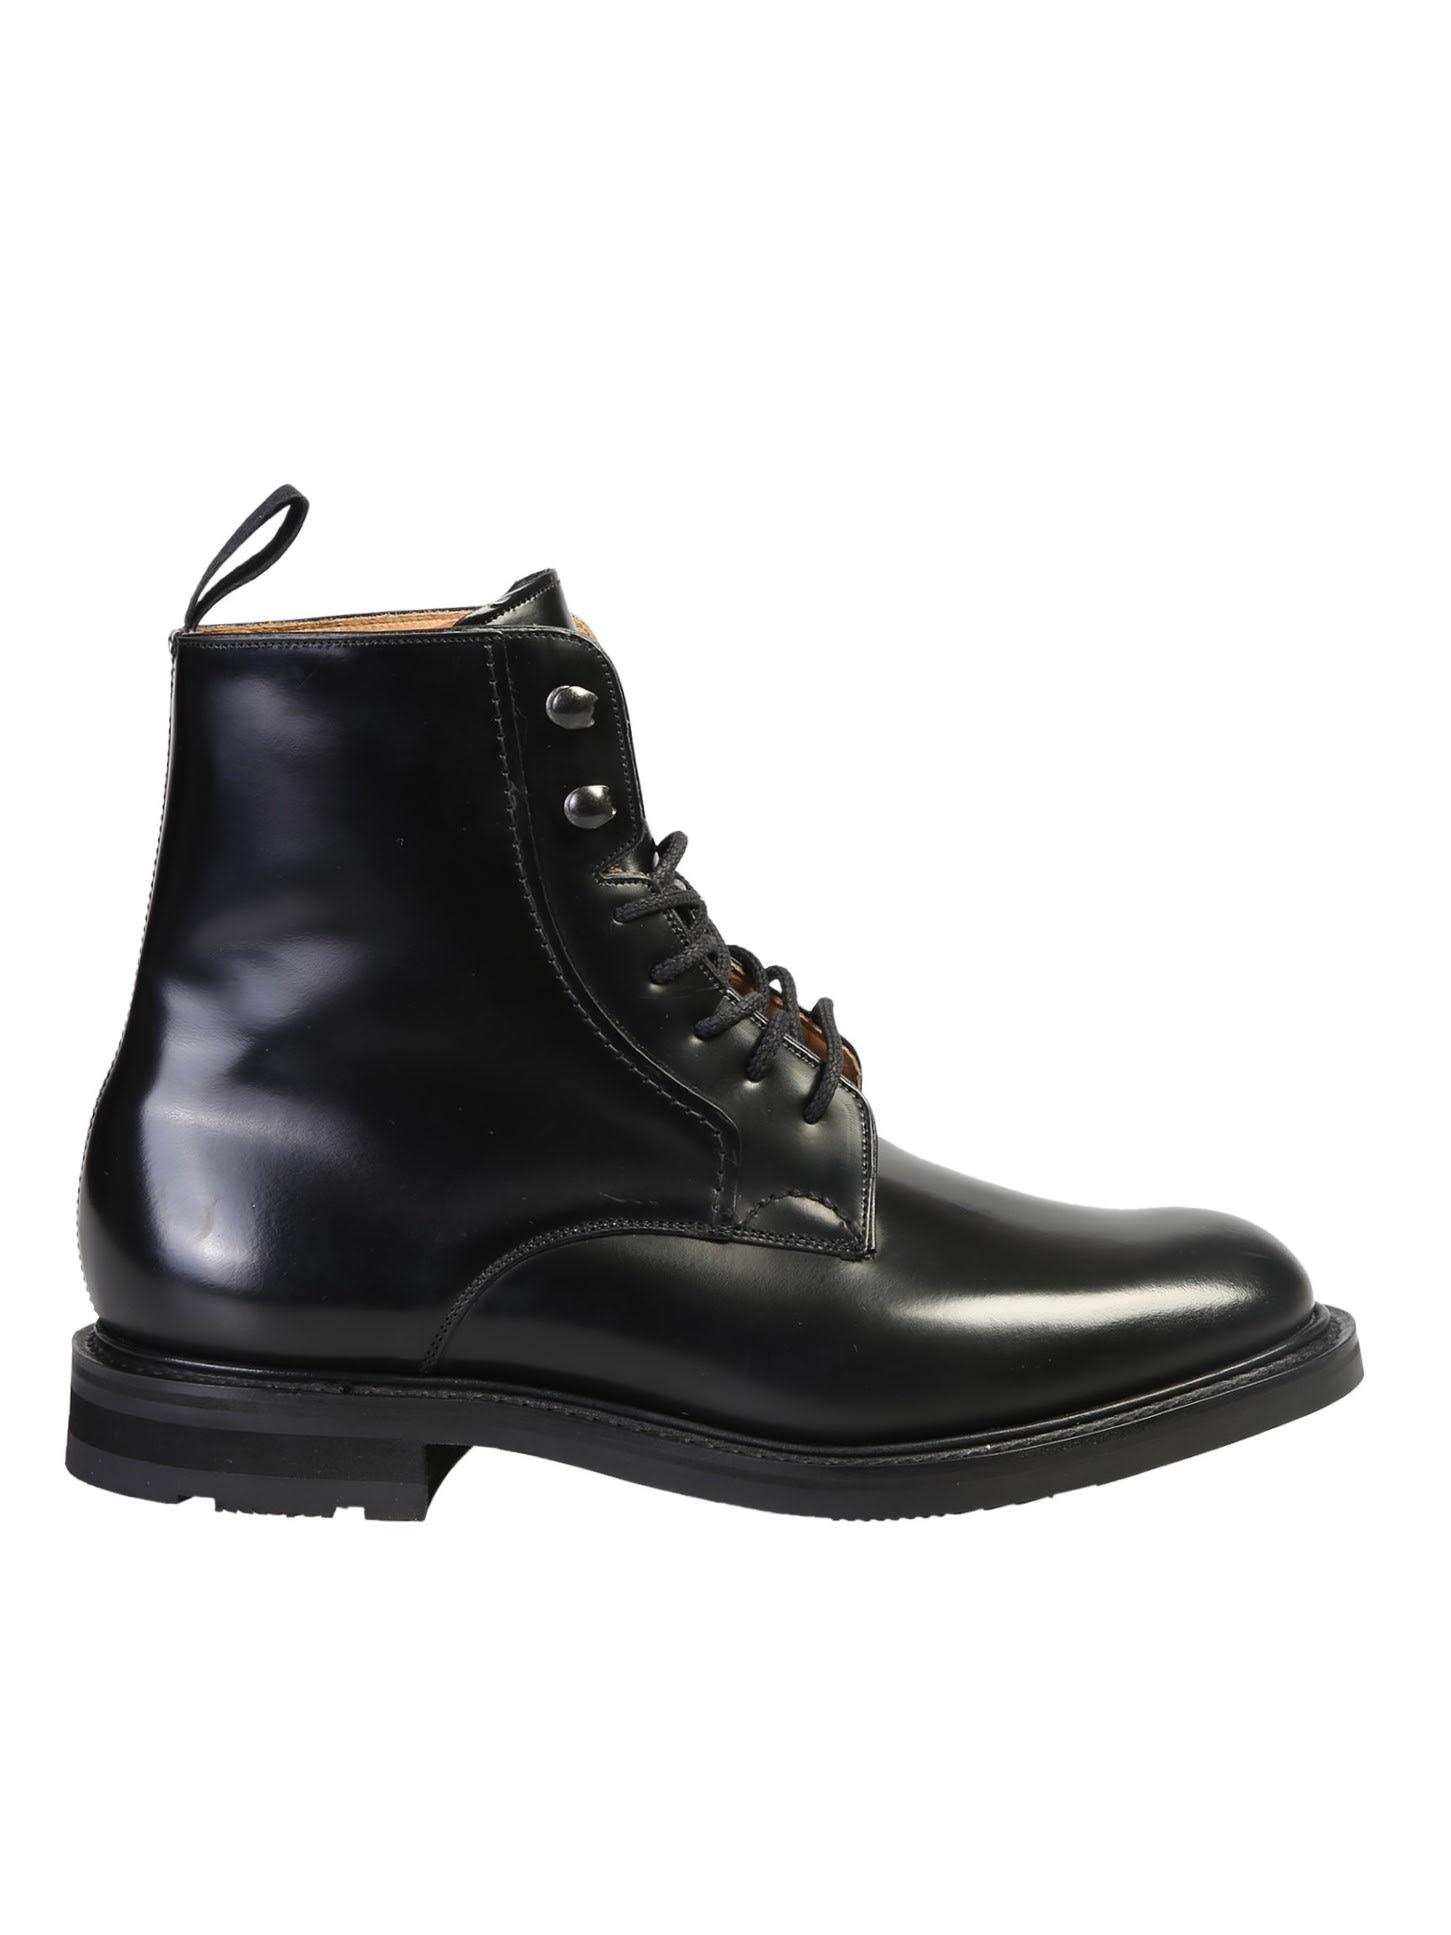 Churchs Wotton Ankle Boots